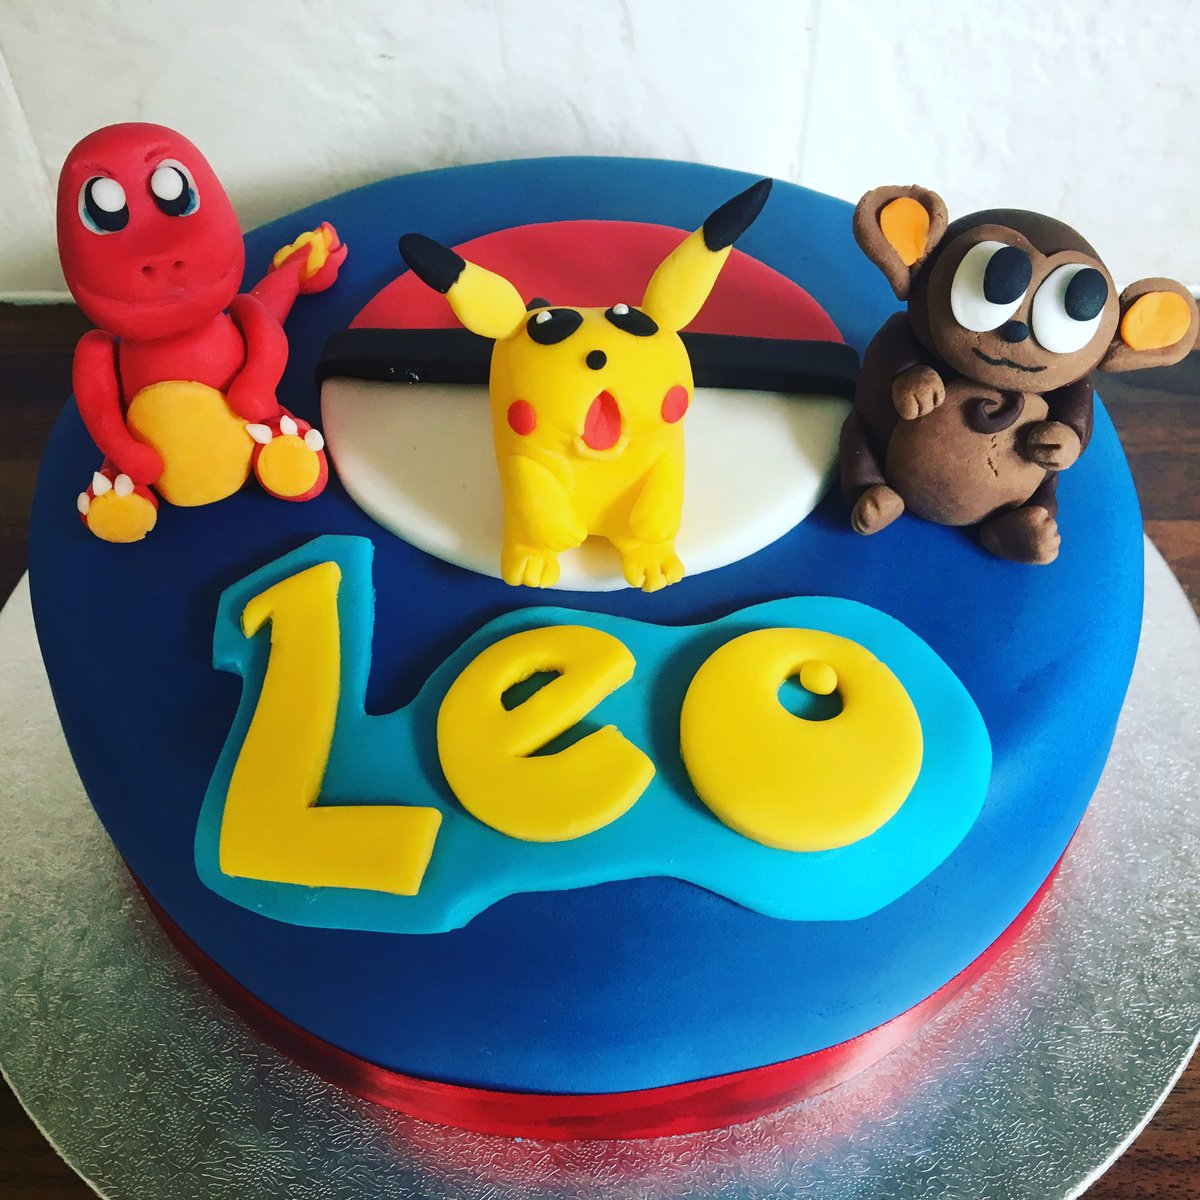 Brilliant Hannahmakescakes On Twitter Happy Pokemon Birthday Leo Cake Funny Birthday Cards Online Elaedamsfinfo